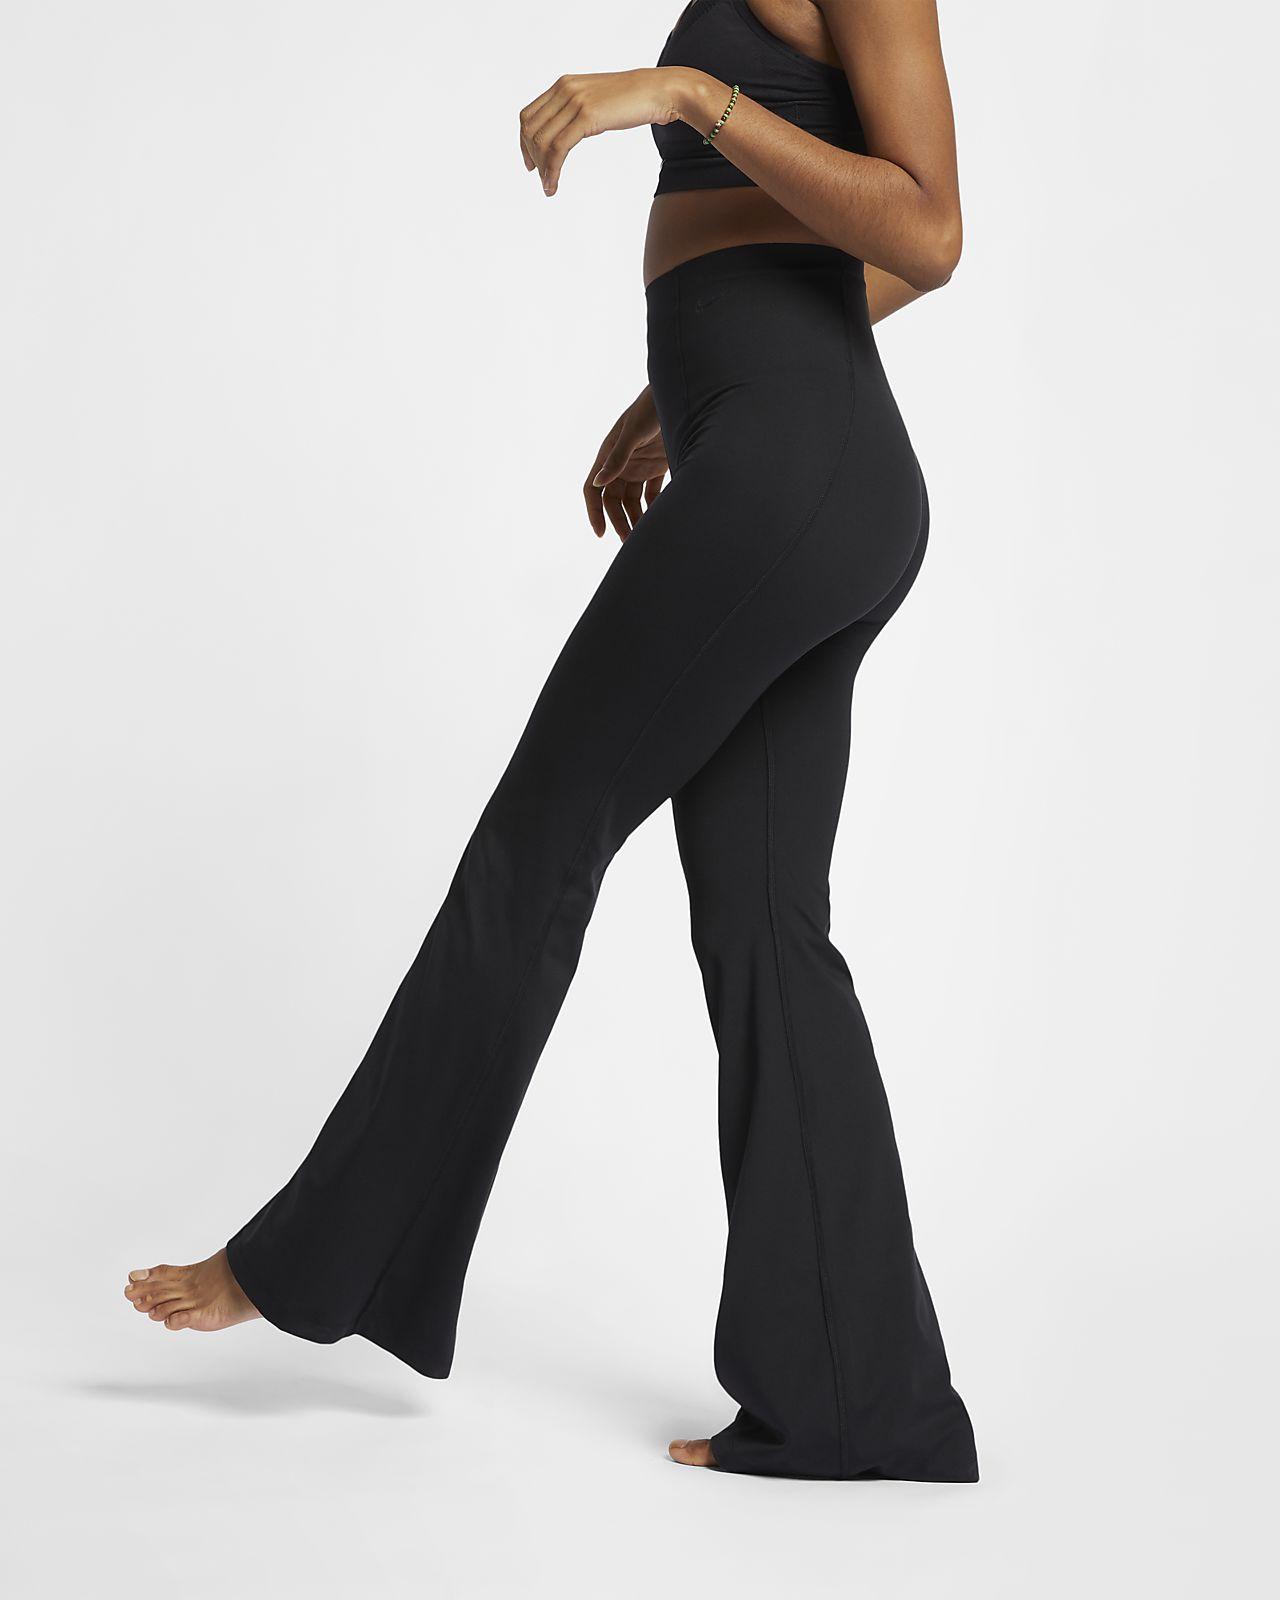 14c9b19a43 Nike Power Studio Lux Women's Yoga Tights